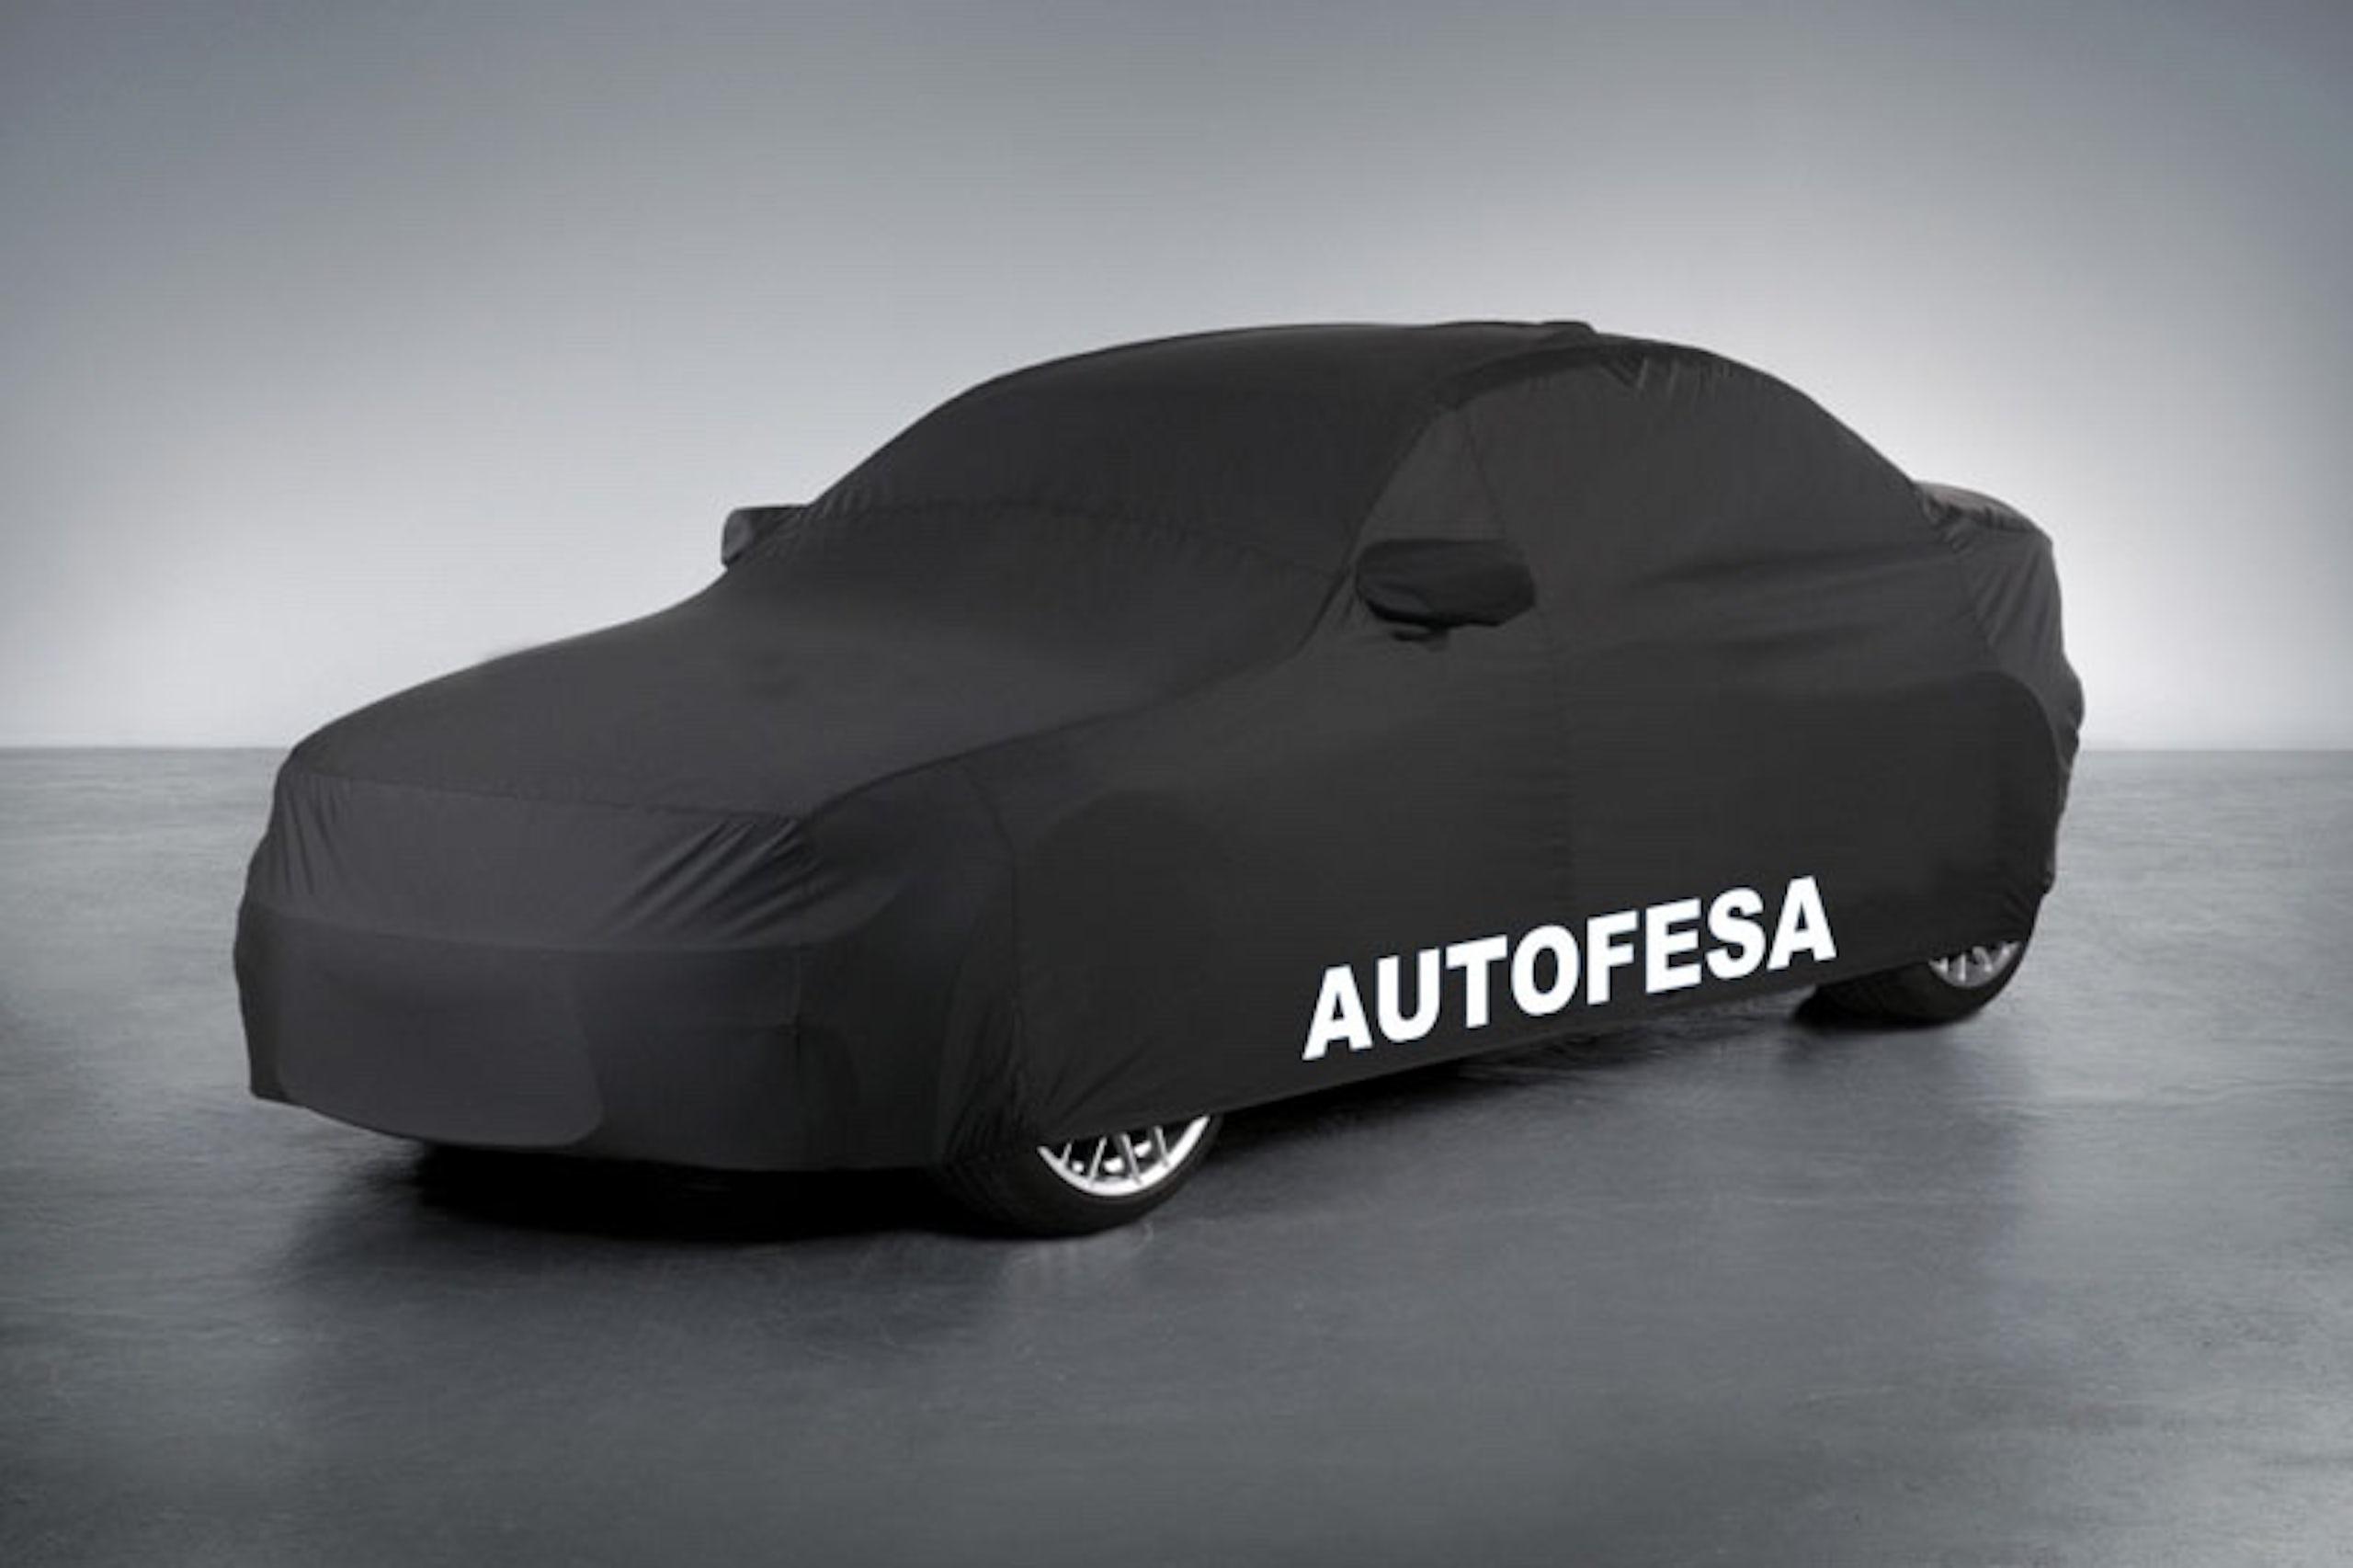 Mitsubishi Outlander 2.0 DI-D 150cv Motion 2WD 5p 7plz Auto S/S - Foto 9